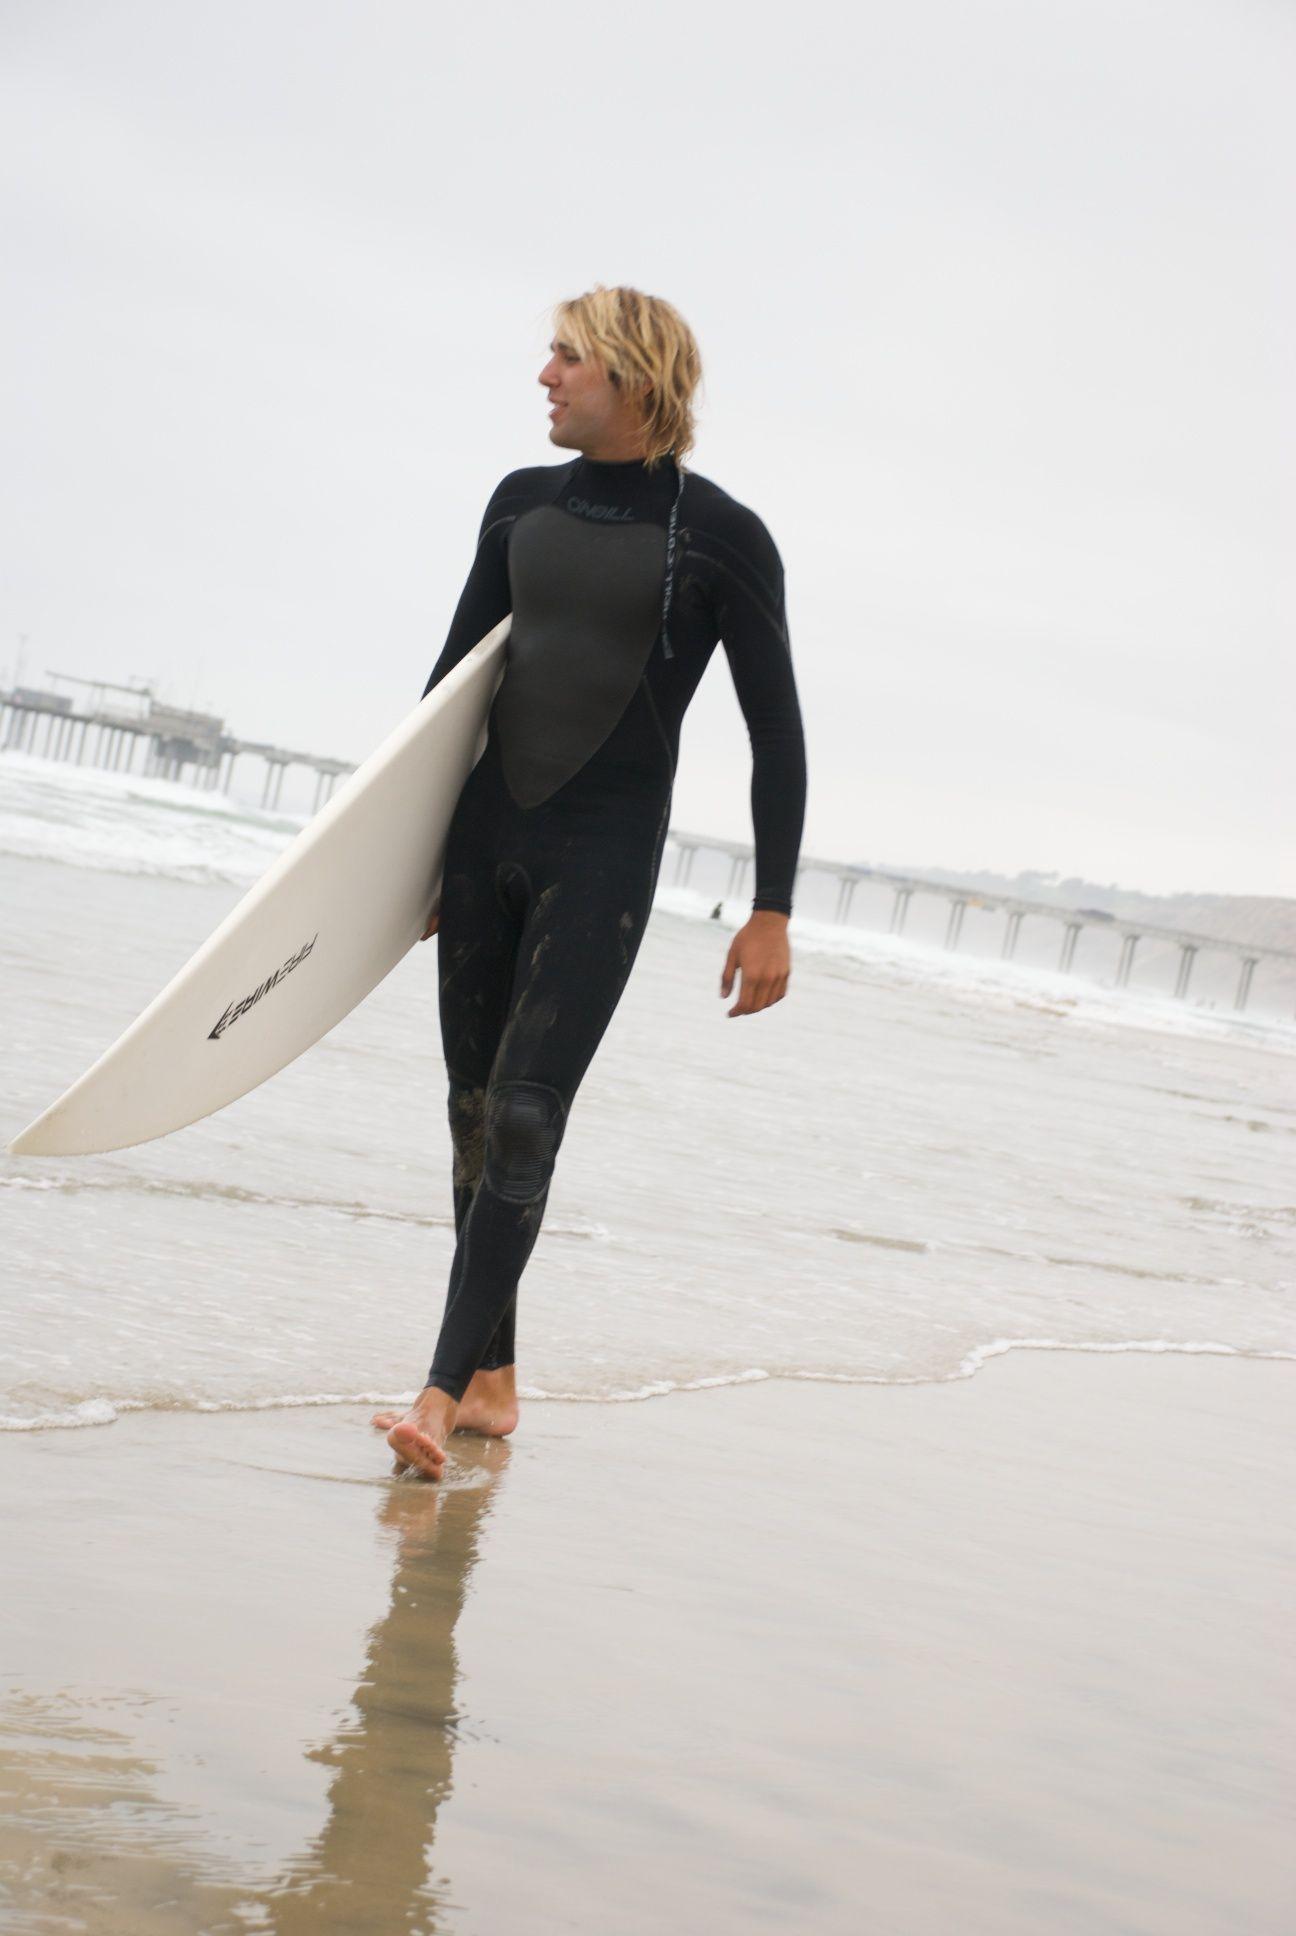 California surfer walking along the beach near La Jolla